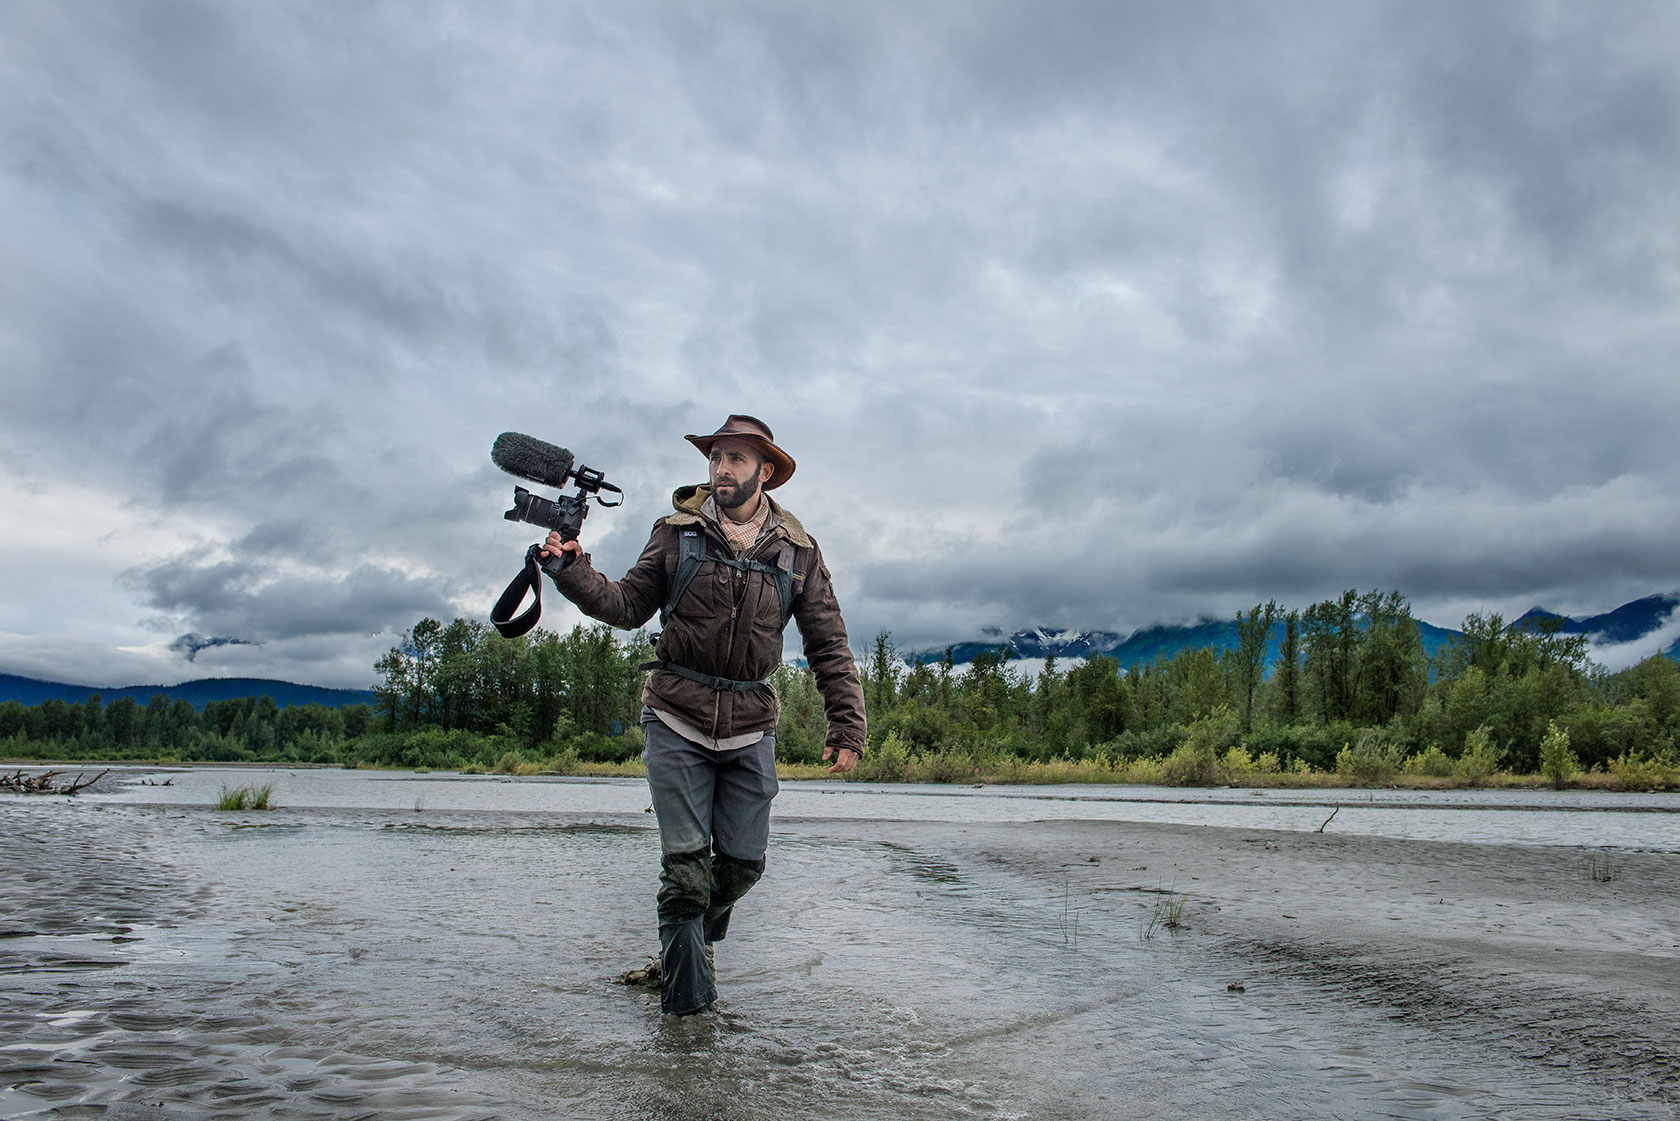 austin-trigg-brave-wilderness-alaska-BW-Coyote-Walks-River-mud.jpg